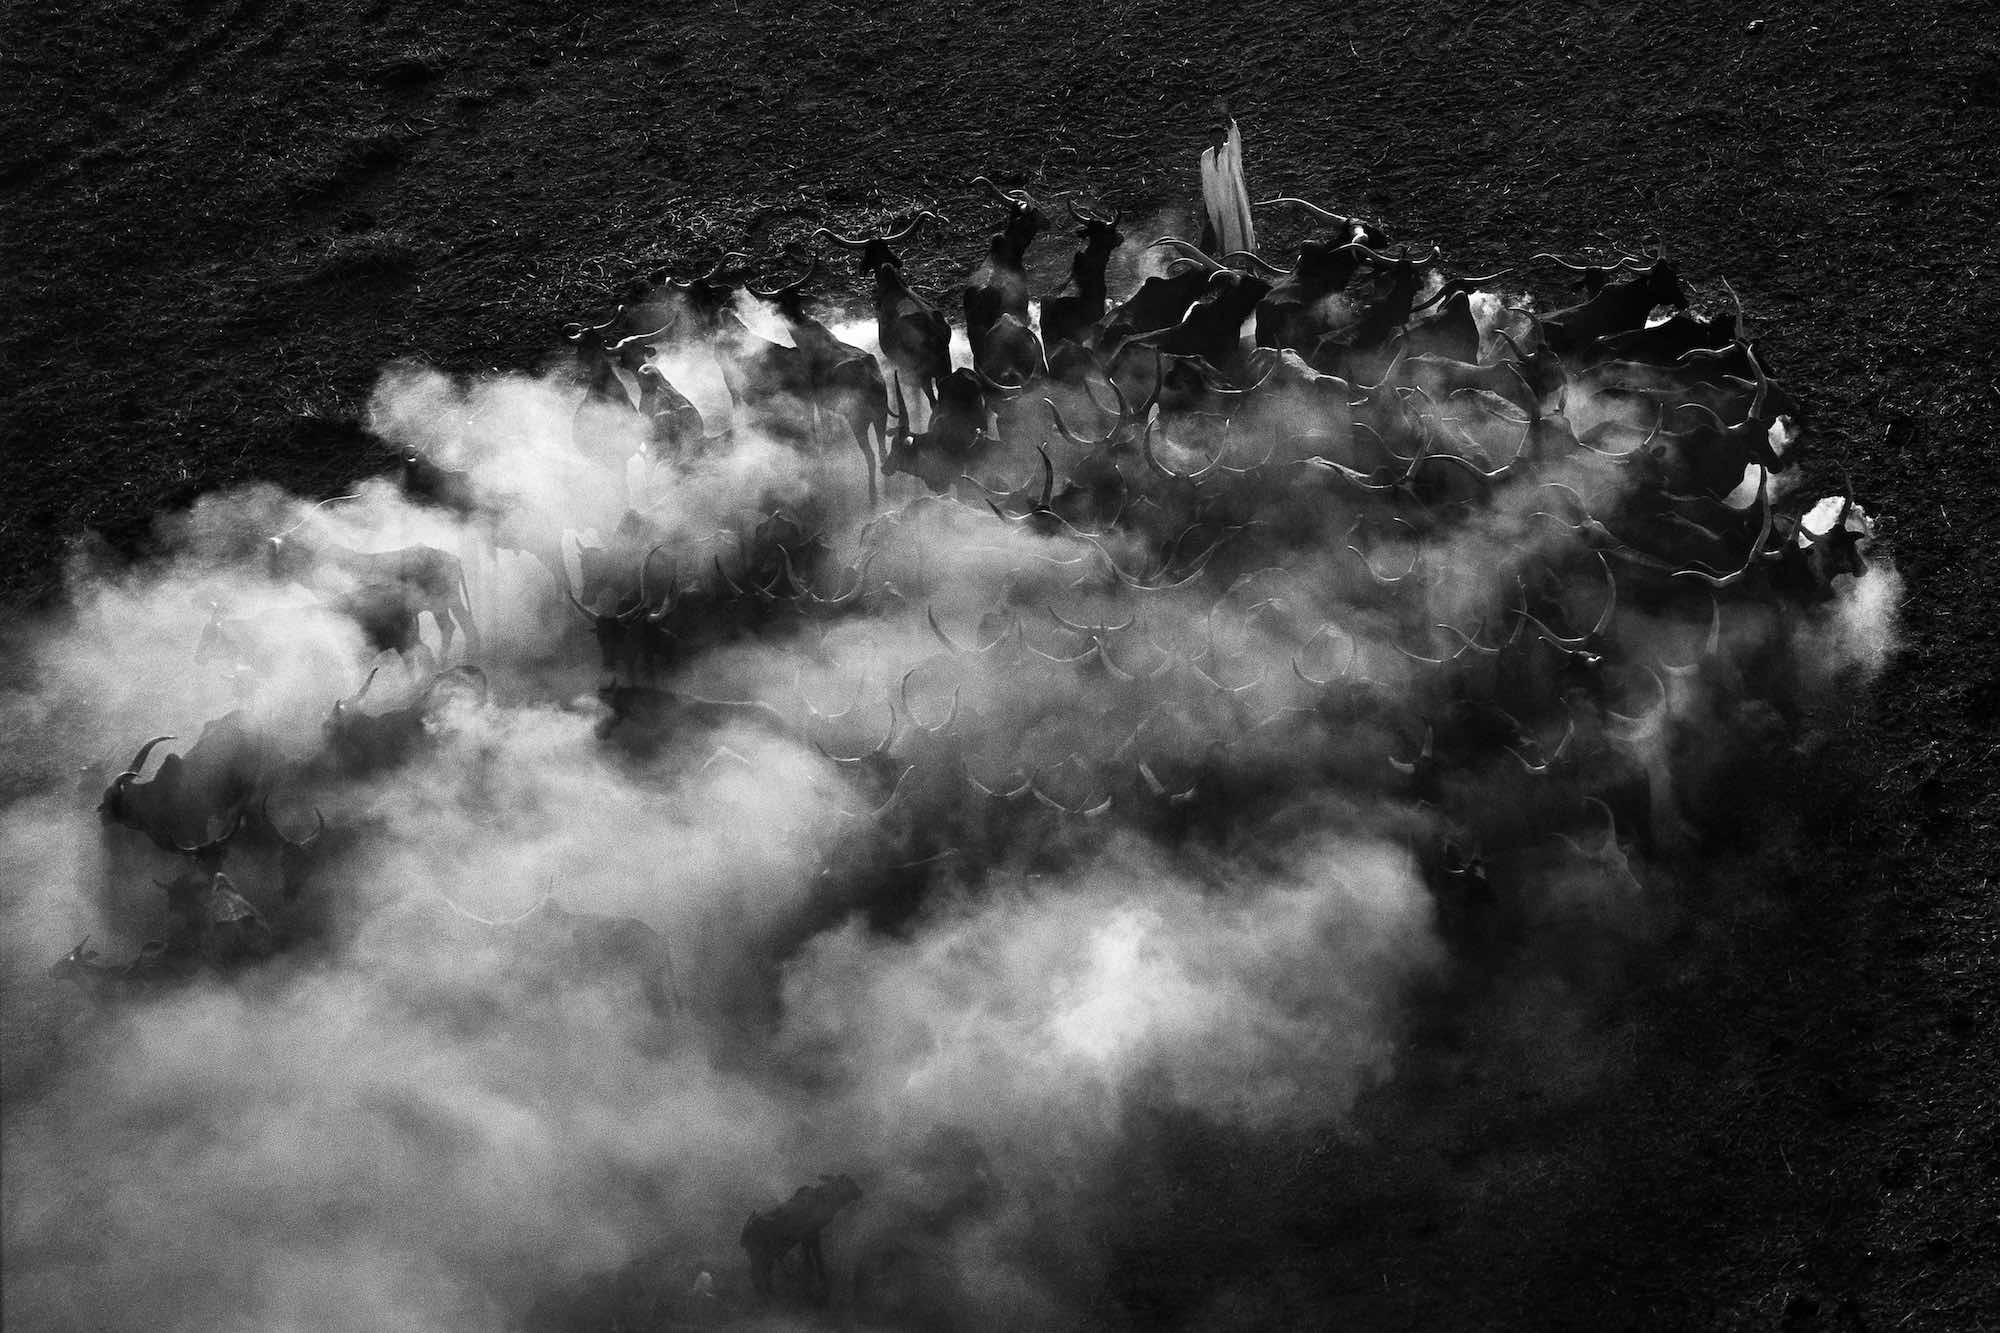 Nomade, Tchad - Yann Arthus-Bertrand Photo